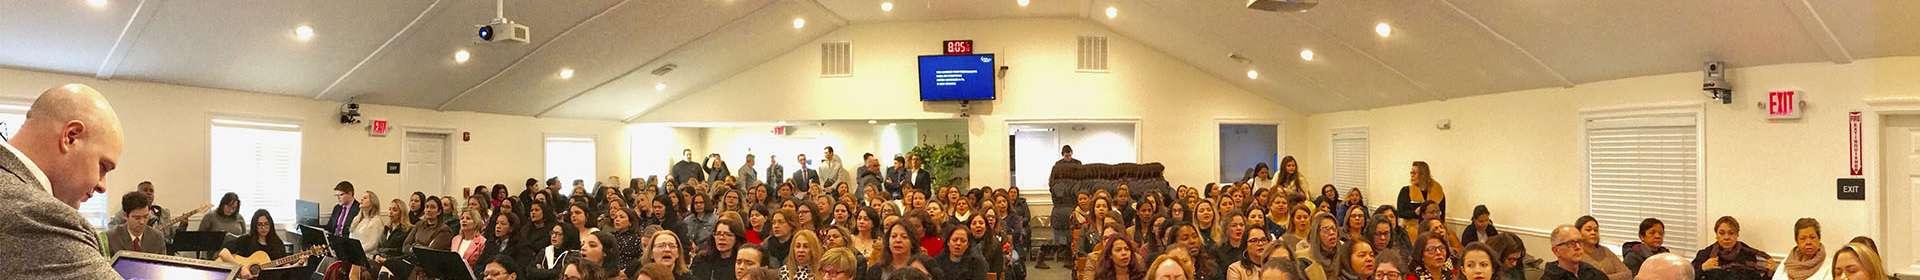 Massachusetts, EUA: Minisseminário reúne trezentas senhoras